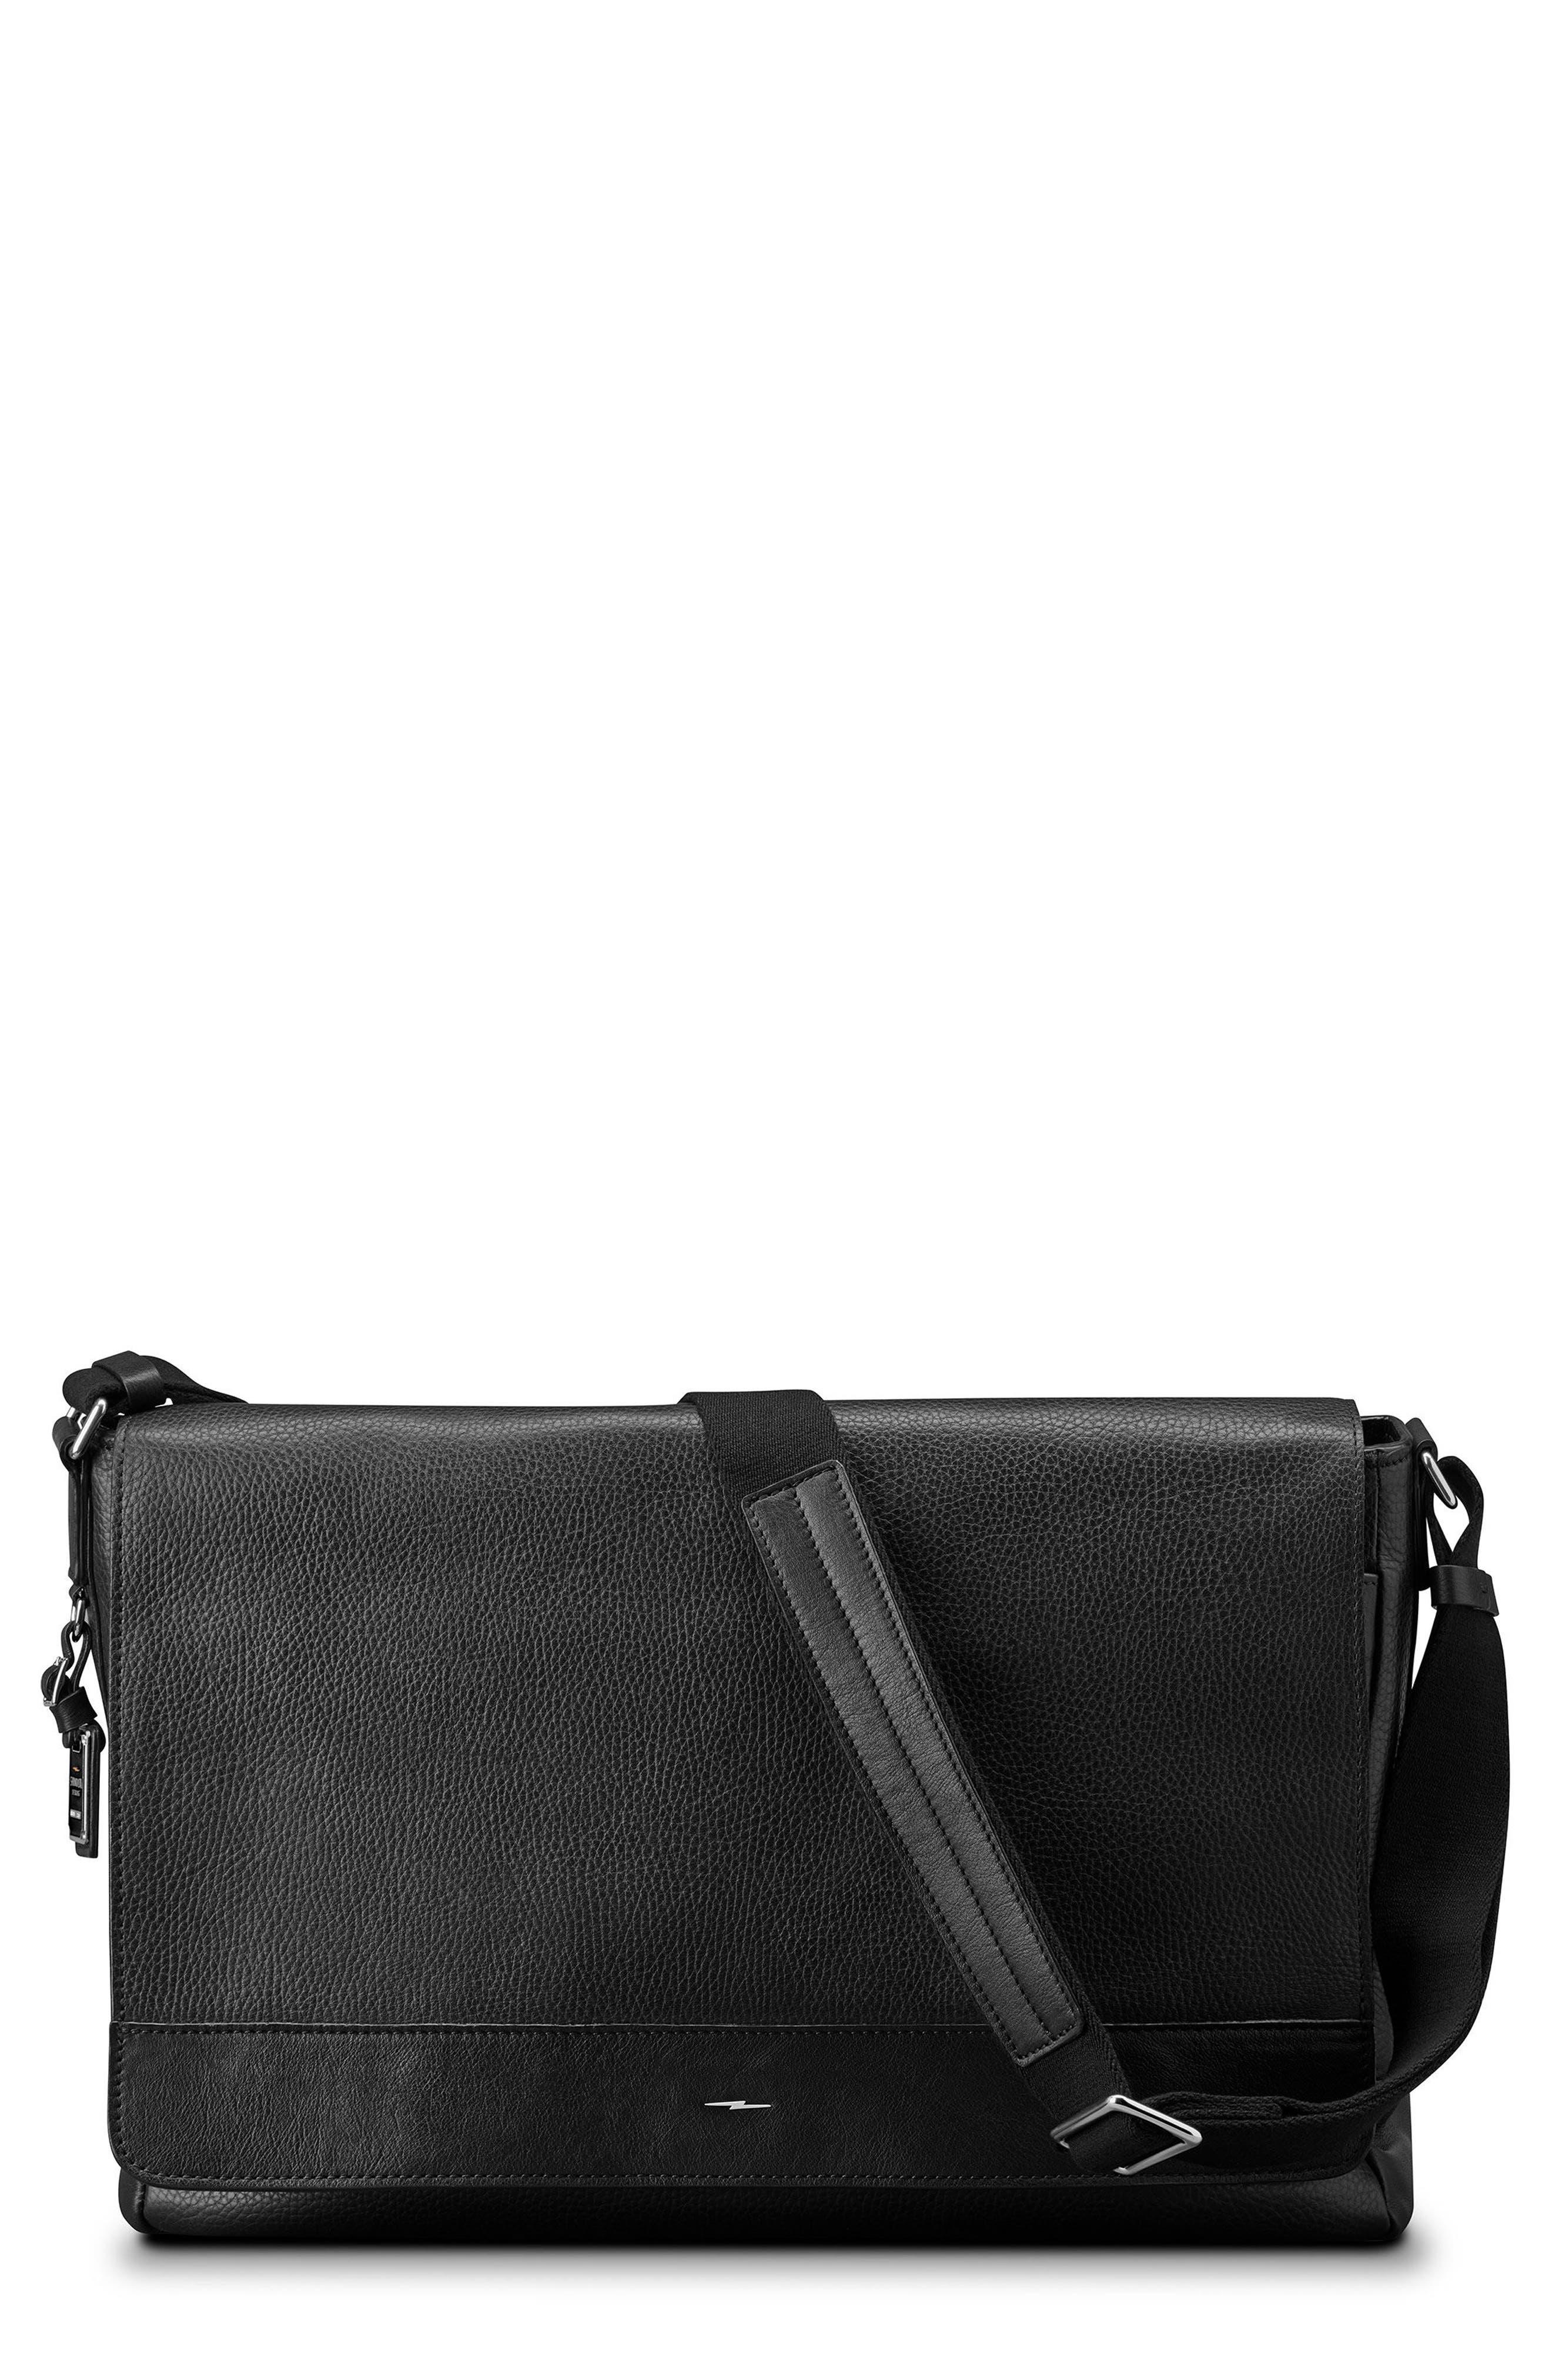 Shinola Luxe Grain Canfield Leather Messenger Bag